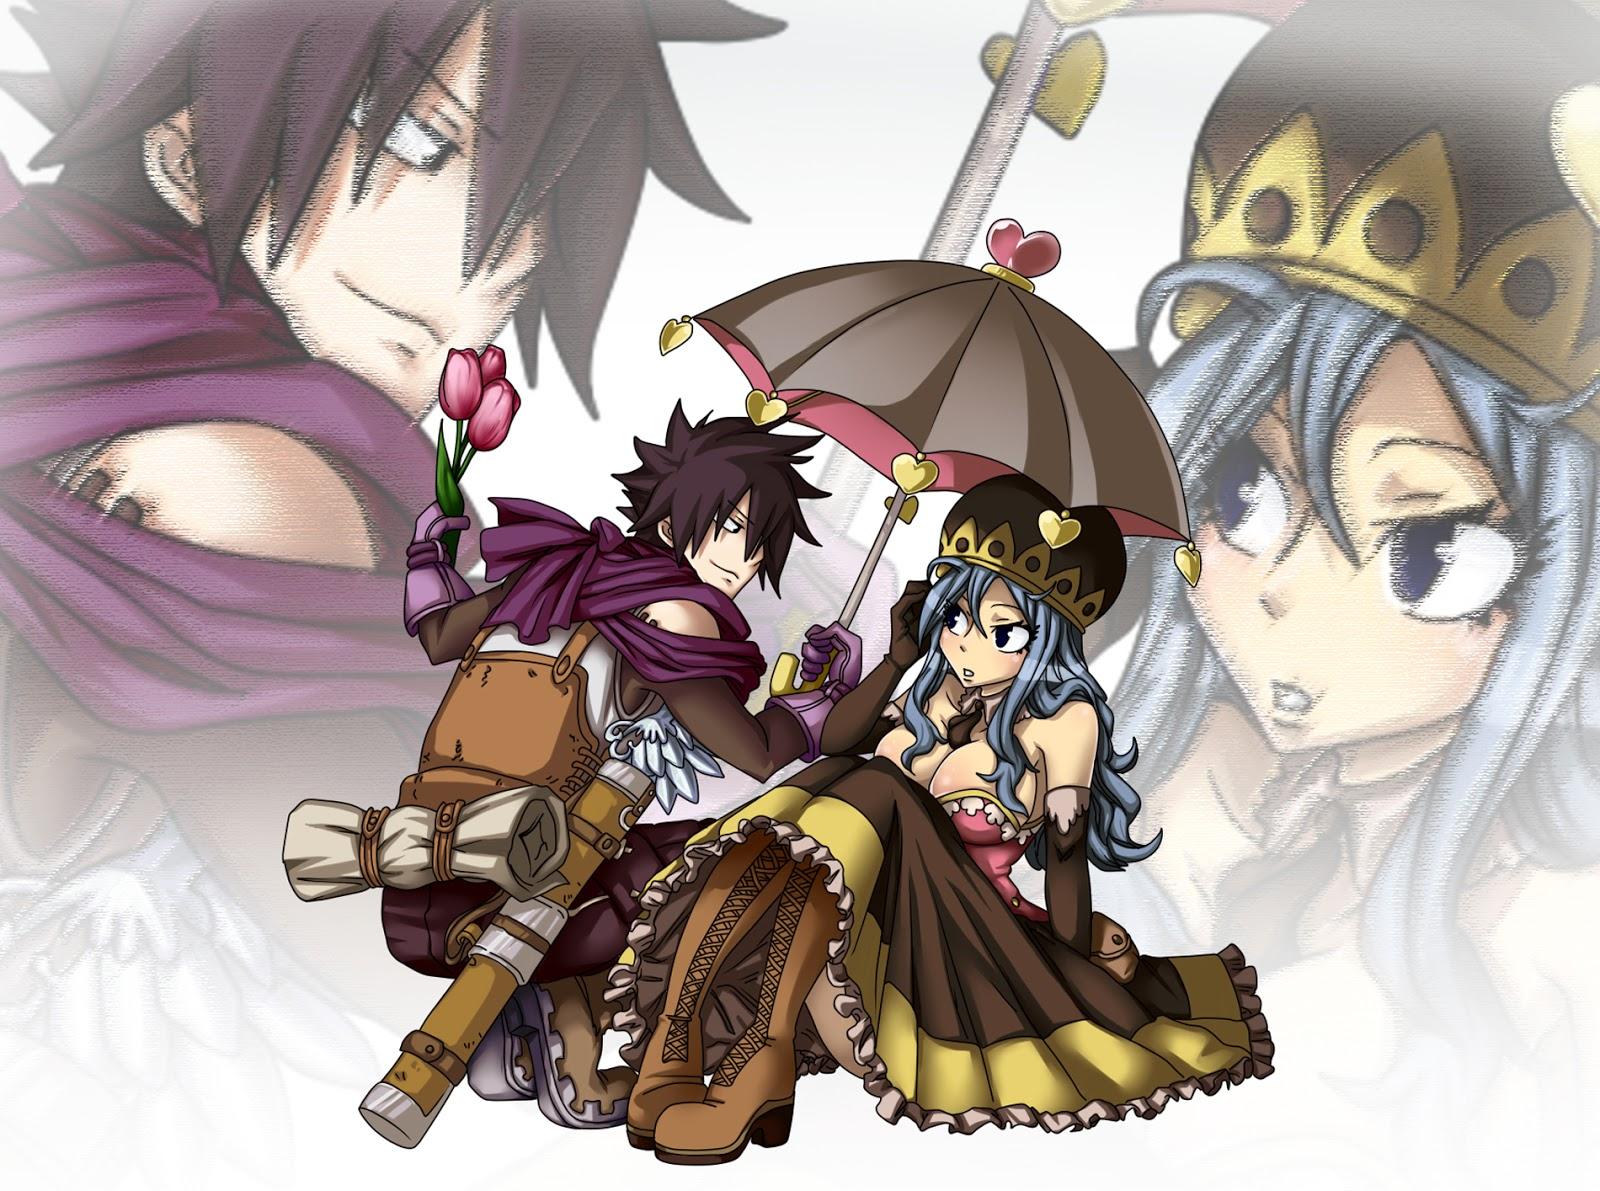 Fairy Tail Gray Fullbuster Juvia Lockser Anime Couple Umbrella HD 1600x1191